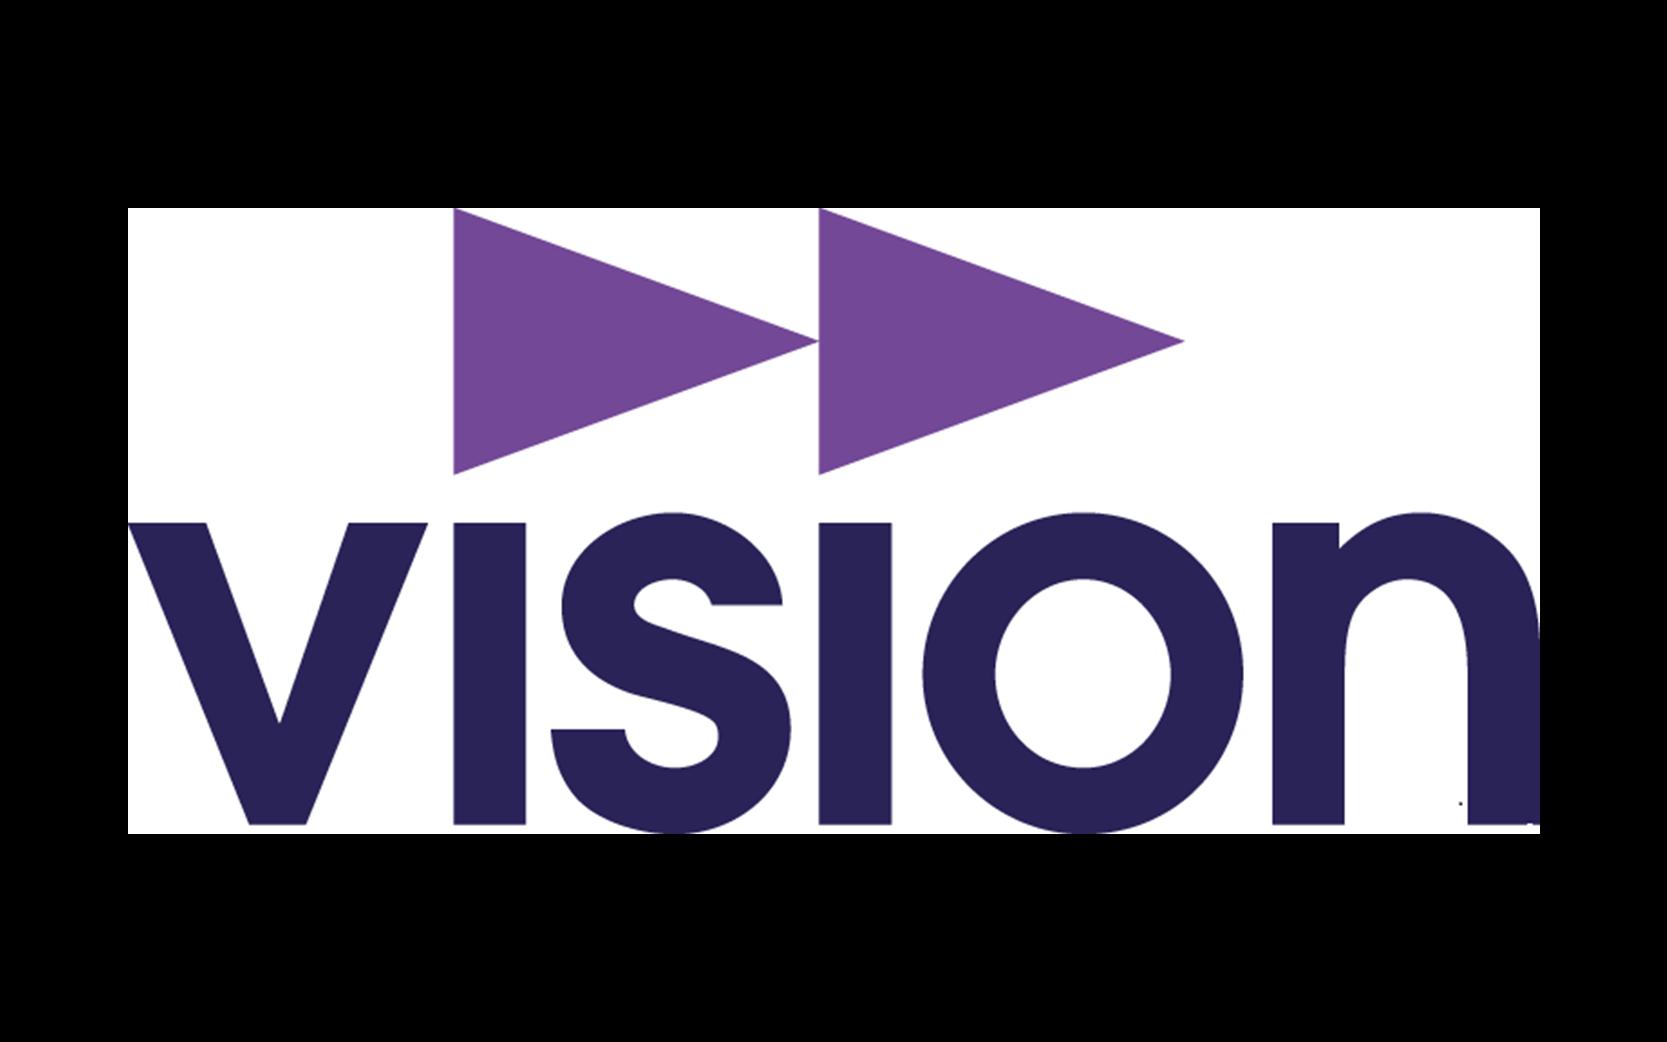 Visions logotyp